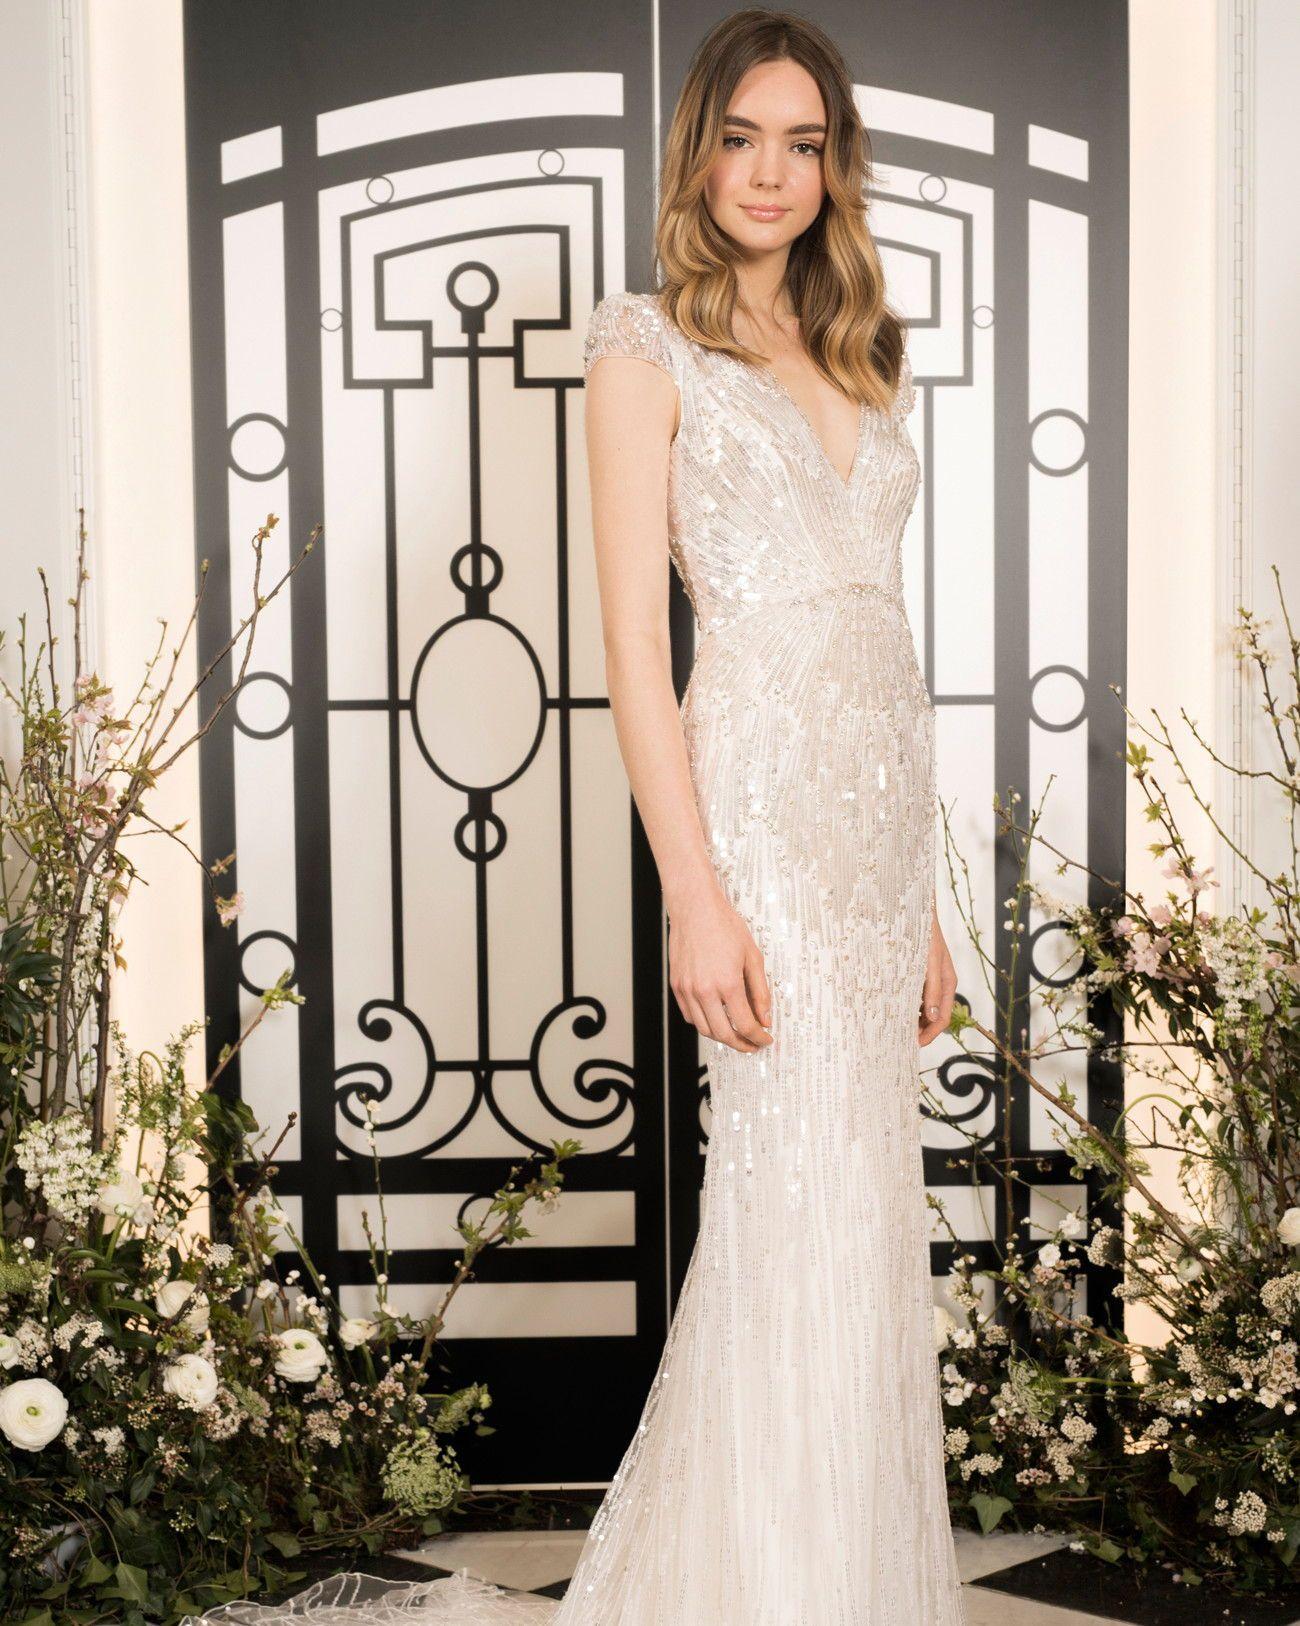 Jenny Packham Spring 2020 Wedding Dress Collection Jenny Packham